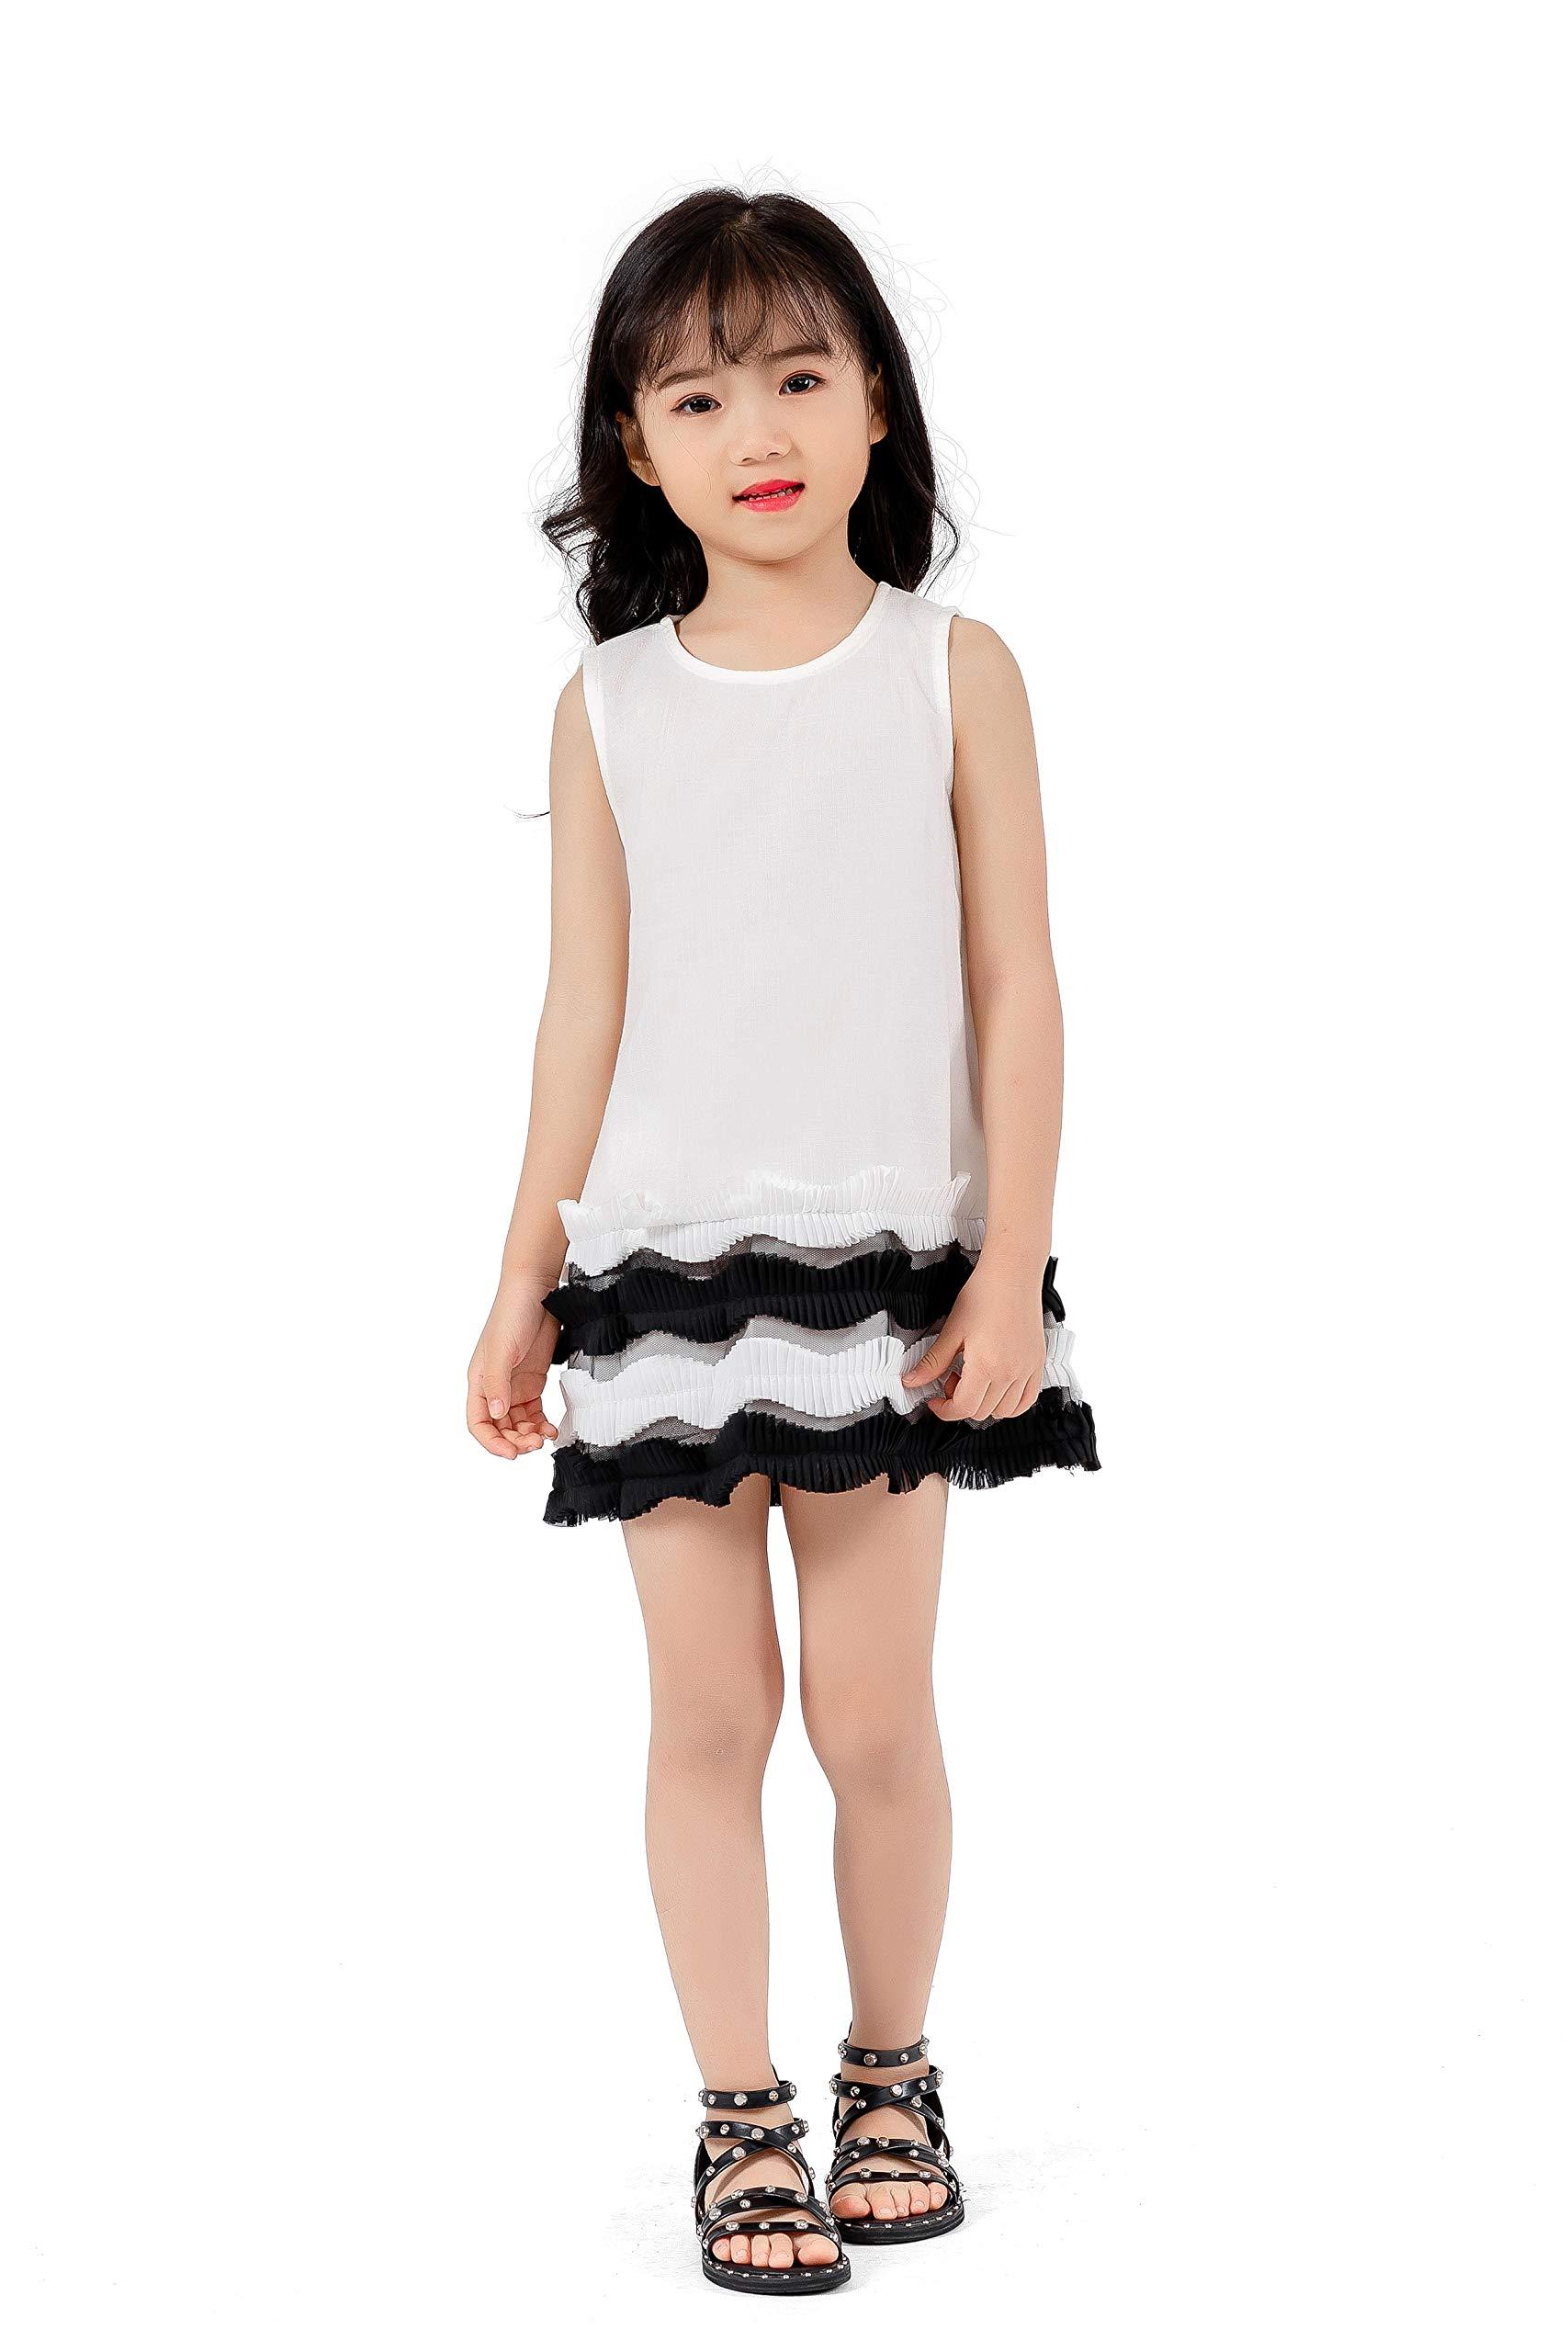 Magkay Kids Big Girls School Uniform Wavy Pleated Hem Sleeveless Zipper Dress White 8Y-9Y